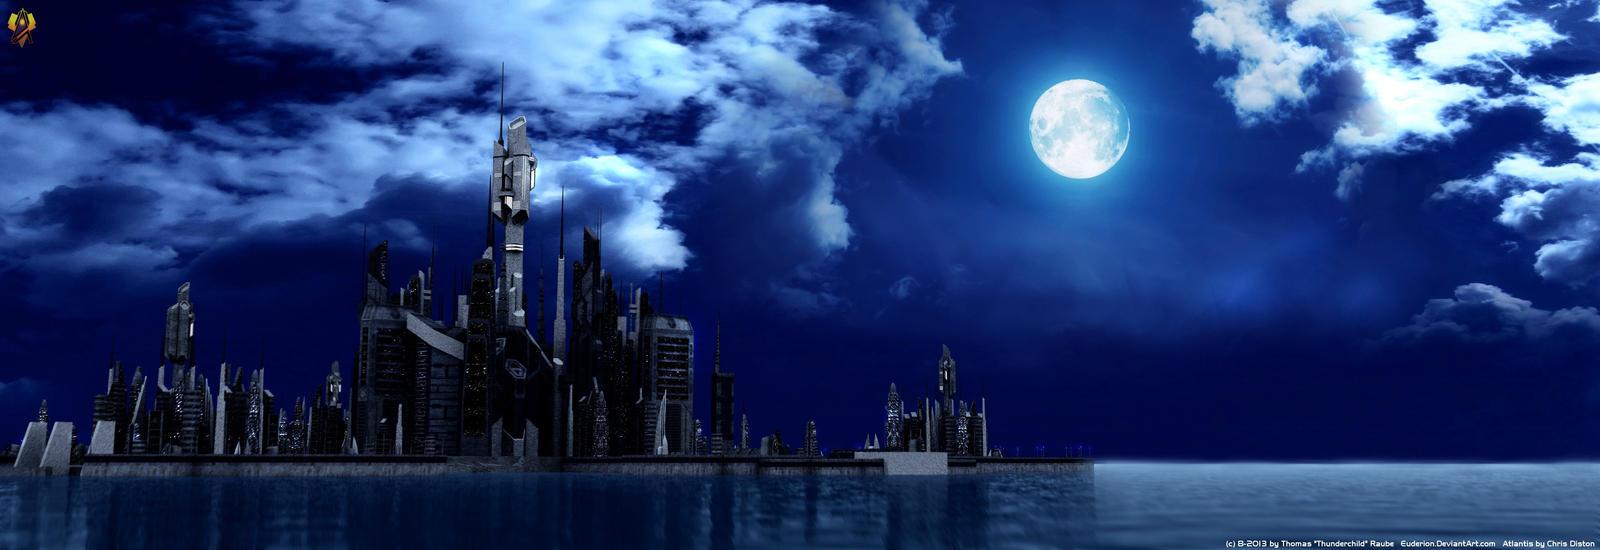 Moon City